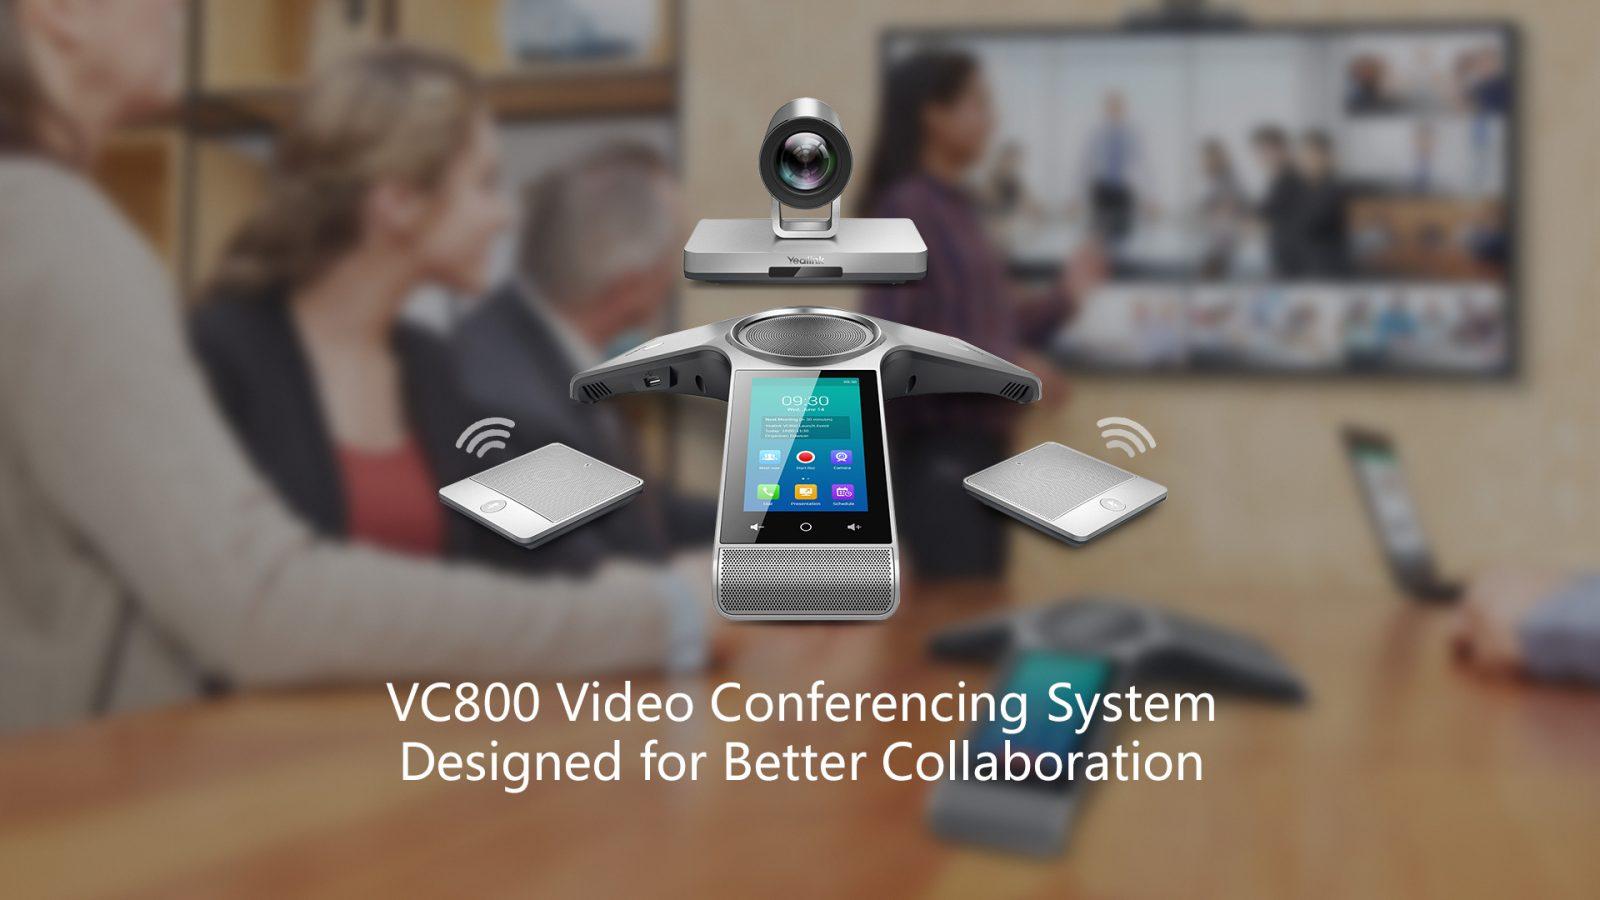 Yealink VC800 Video Conference System- Hong Kong Customer, please contact us. Tel: 3900 1988 - Matrix Technology HK Ltd